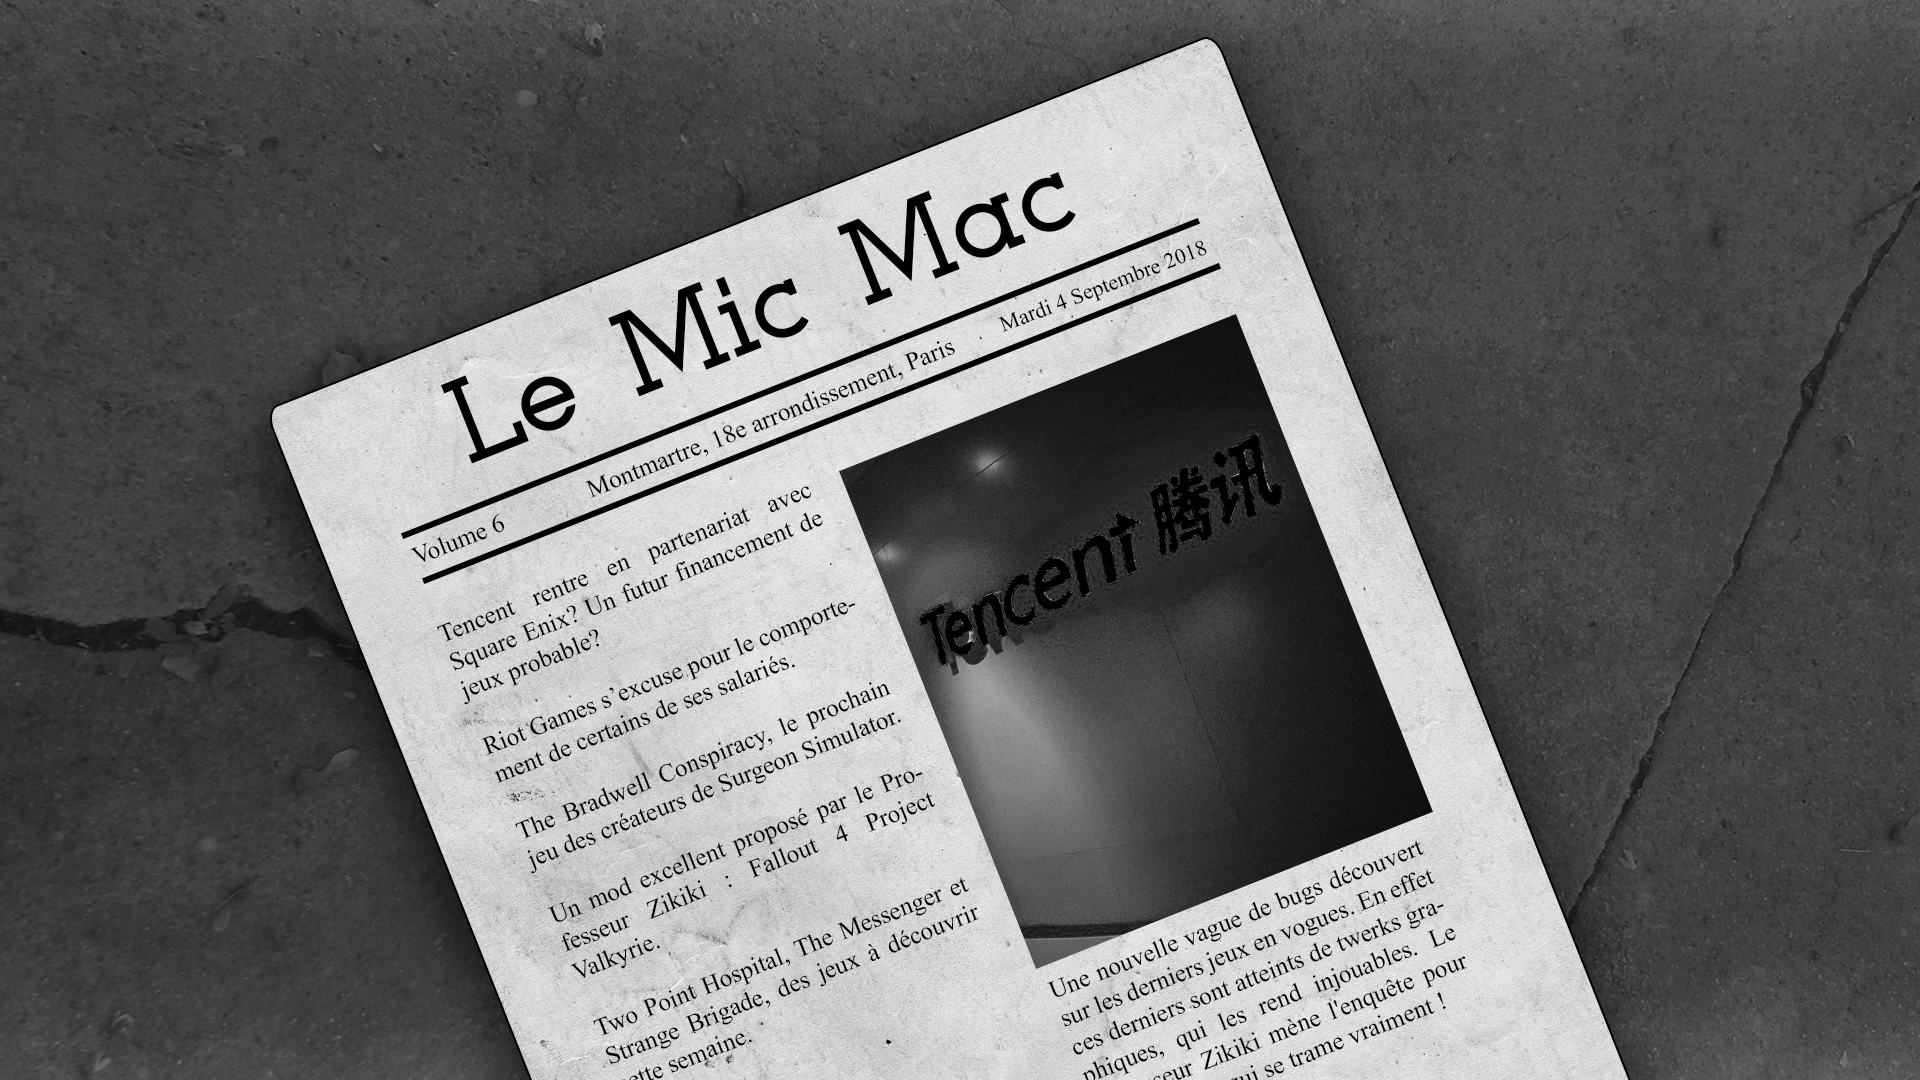 Au Tour du Mic Podcast – Mic Mac #6 : 28/08/2018 au 03/09/2018